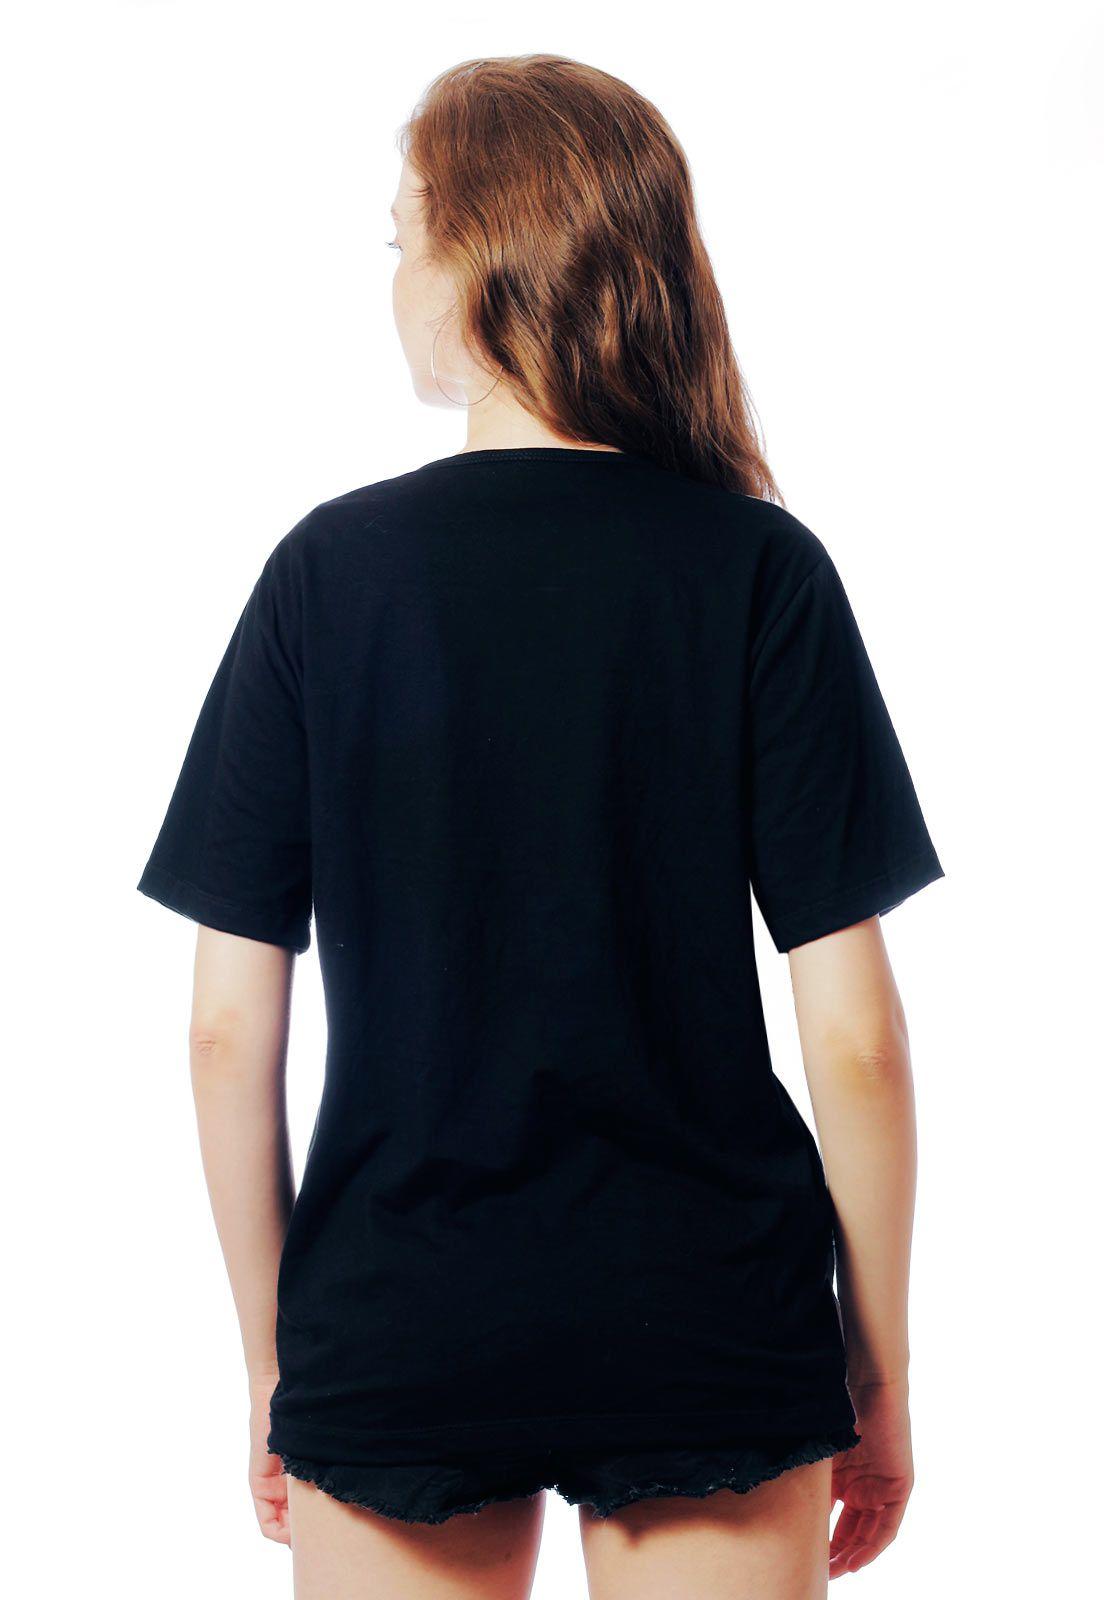 Camiseta ElephunK Estampada Neon Tiger Preta